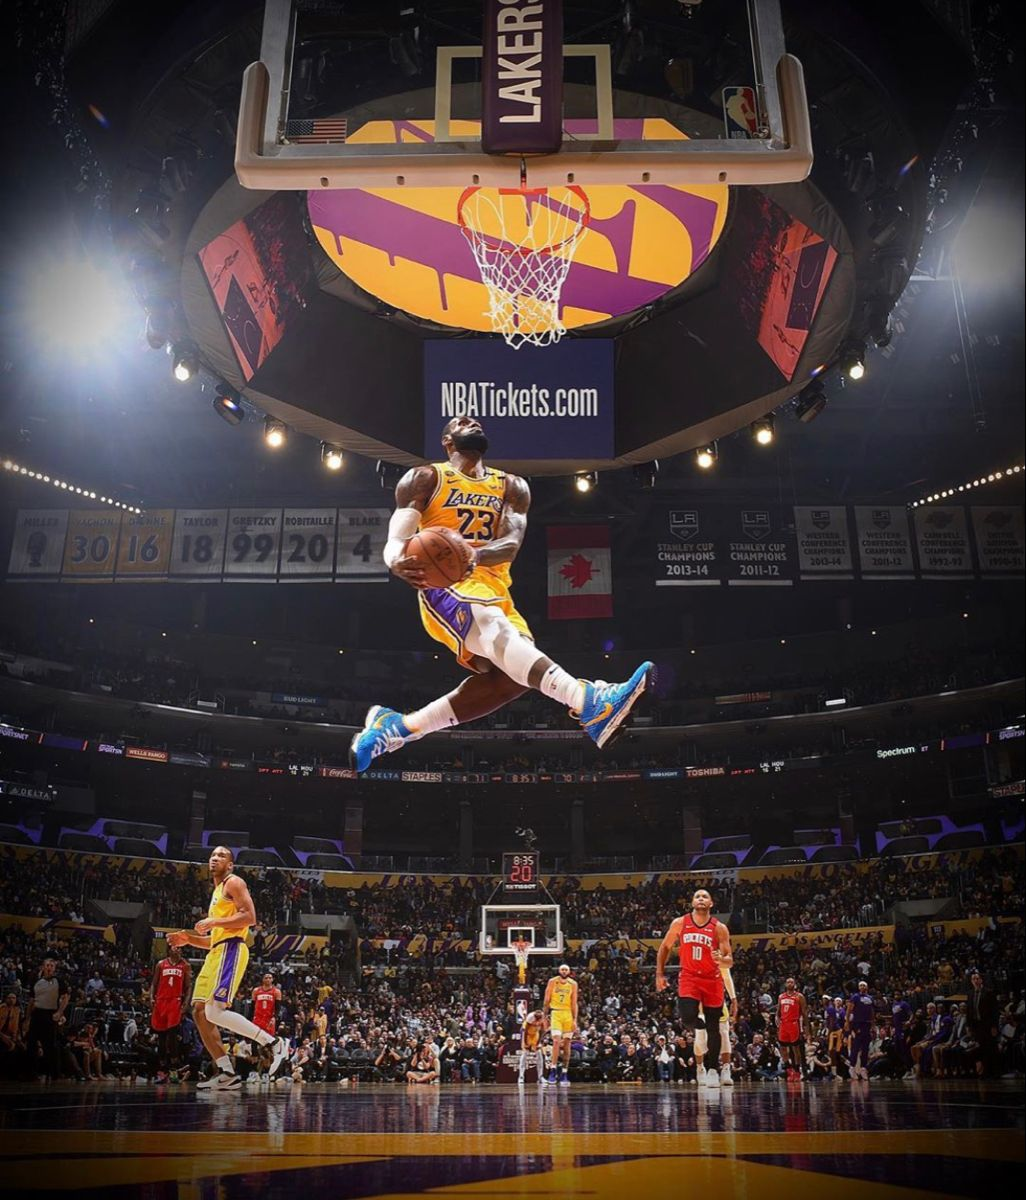 Nba On Instagram Flight 23 In 2020 Nba Lebron James Lakers Lebron James